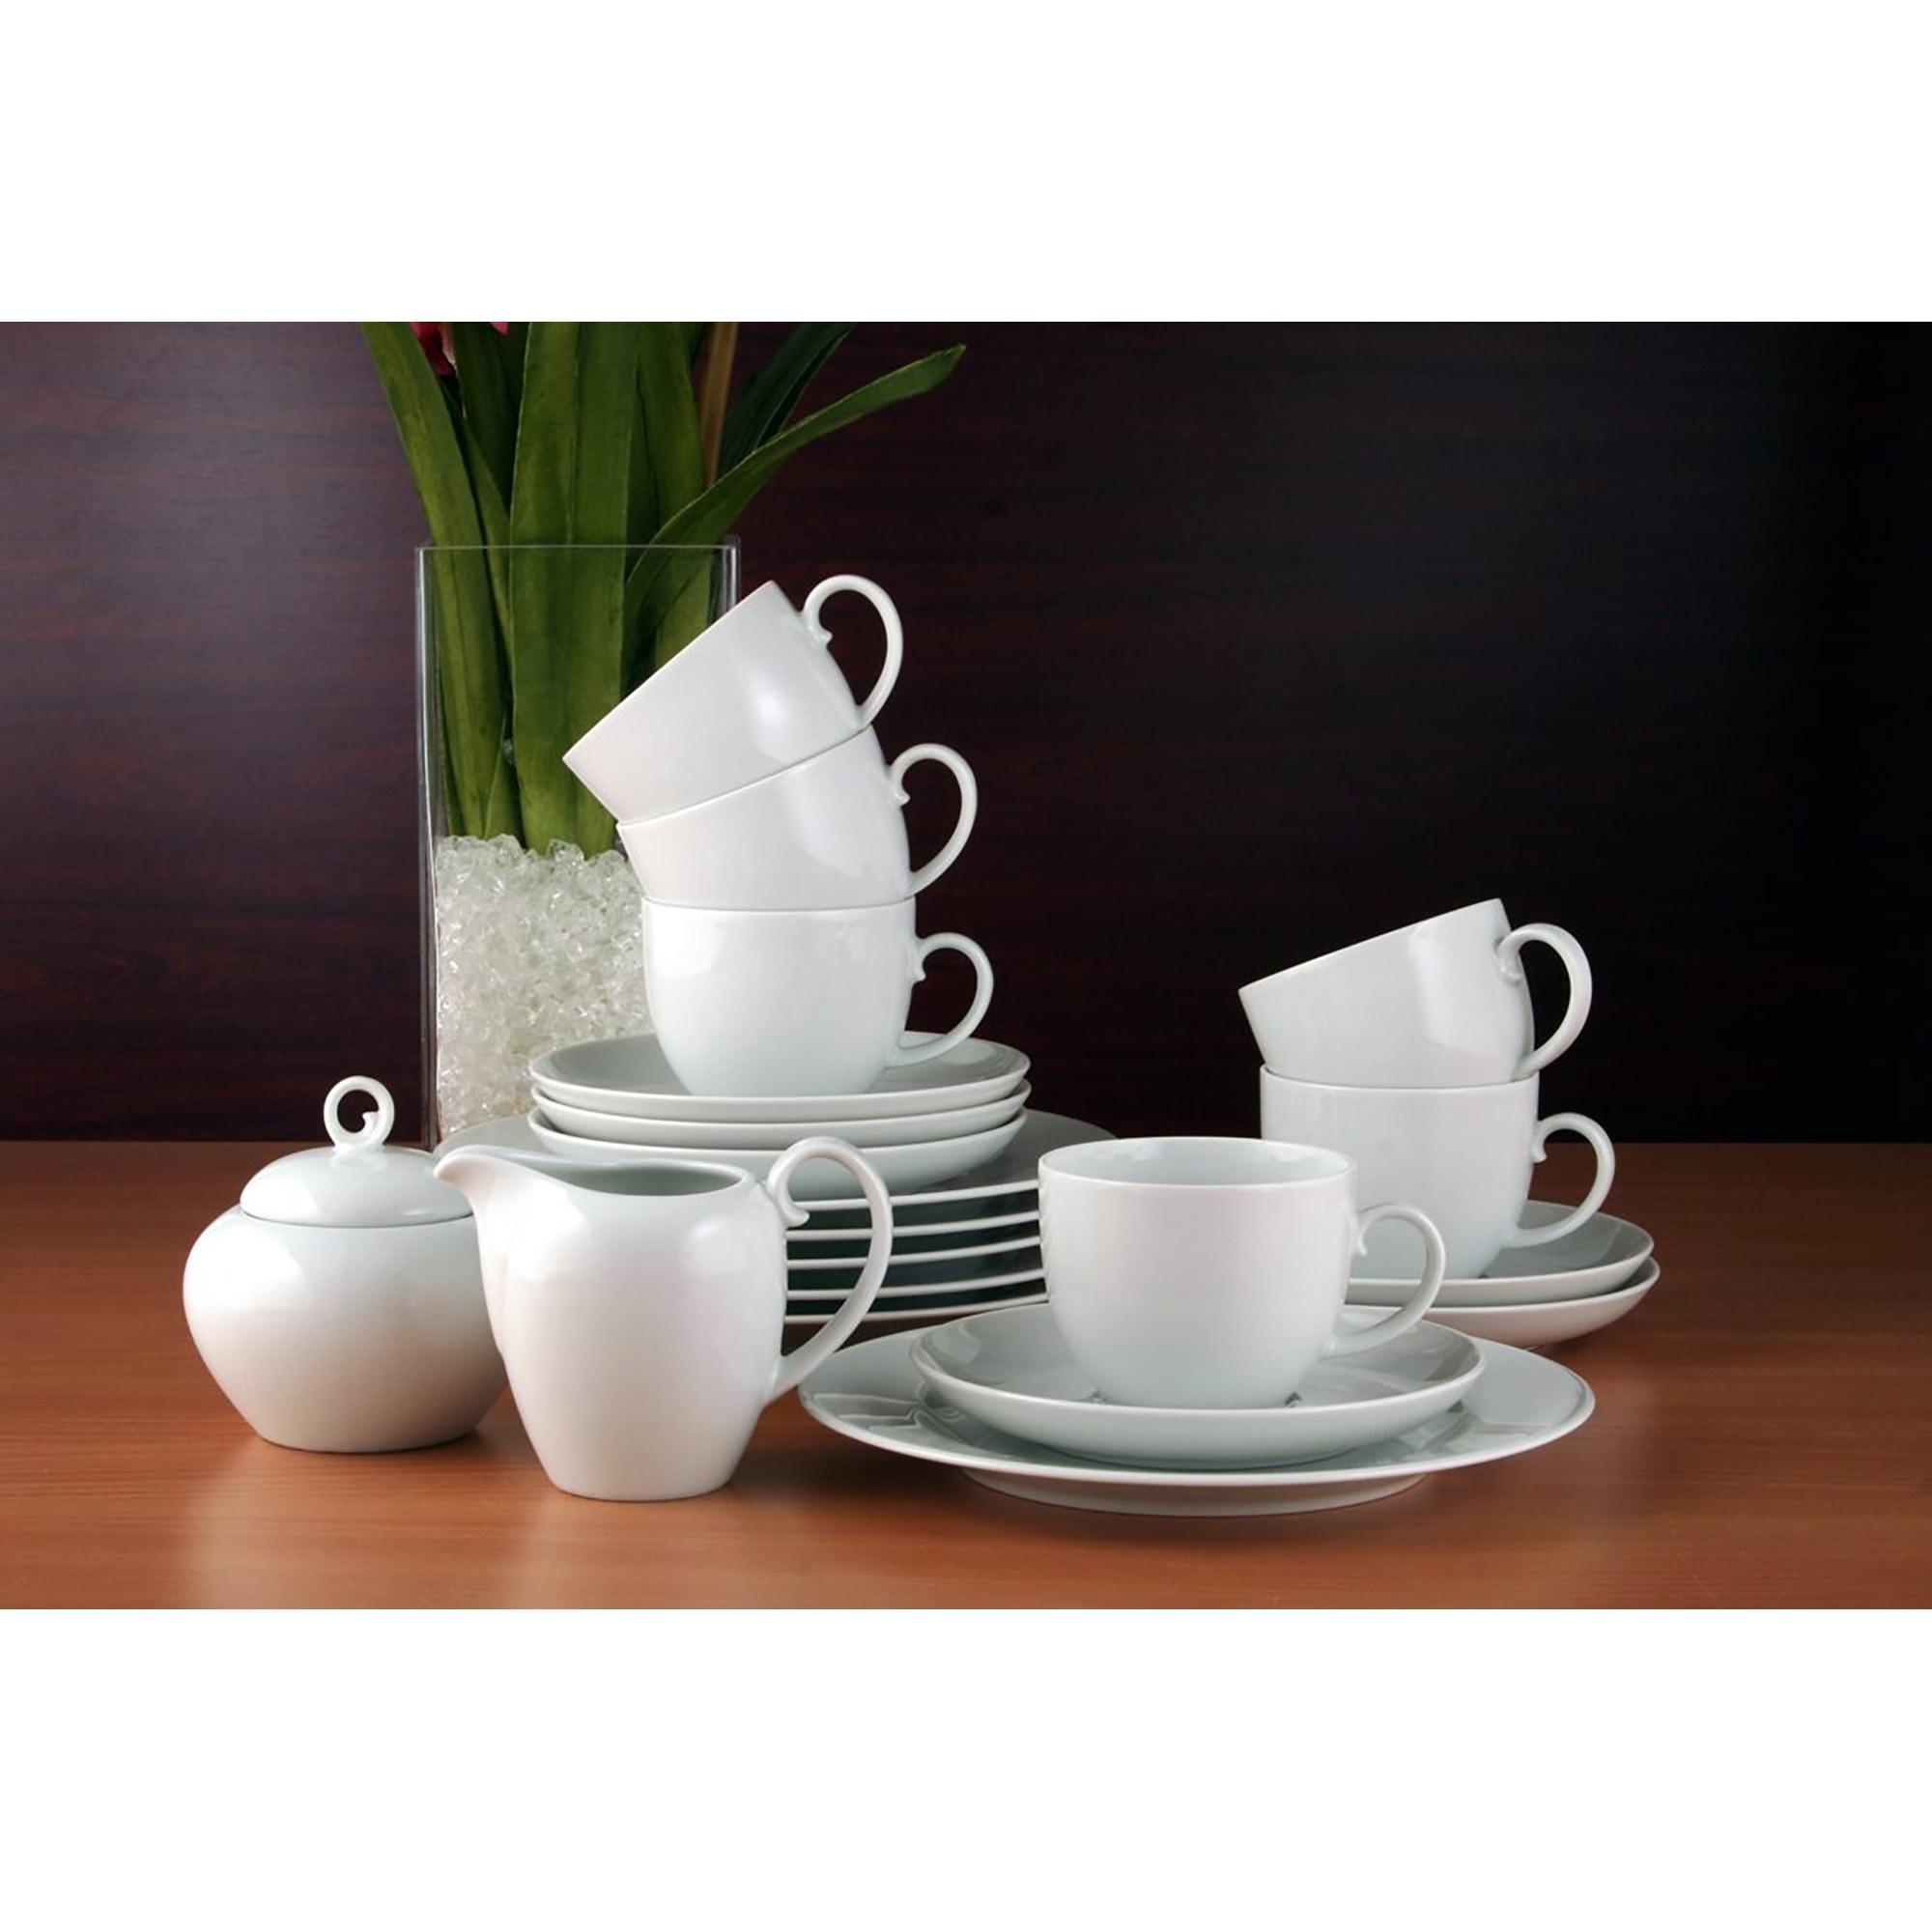 seltmann weiden rondo liane kaffeeservice 20 teilig wei uni ebay. Black Bedroom Furniture Sets. Home Design Ideas